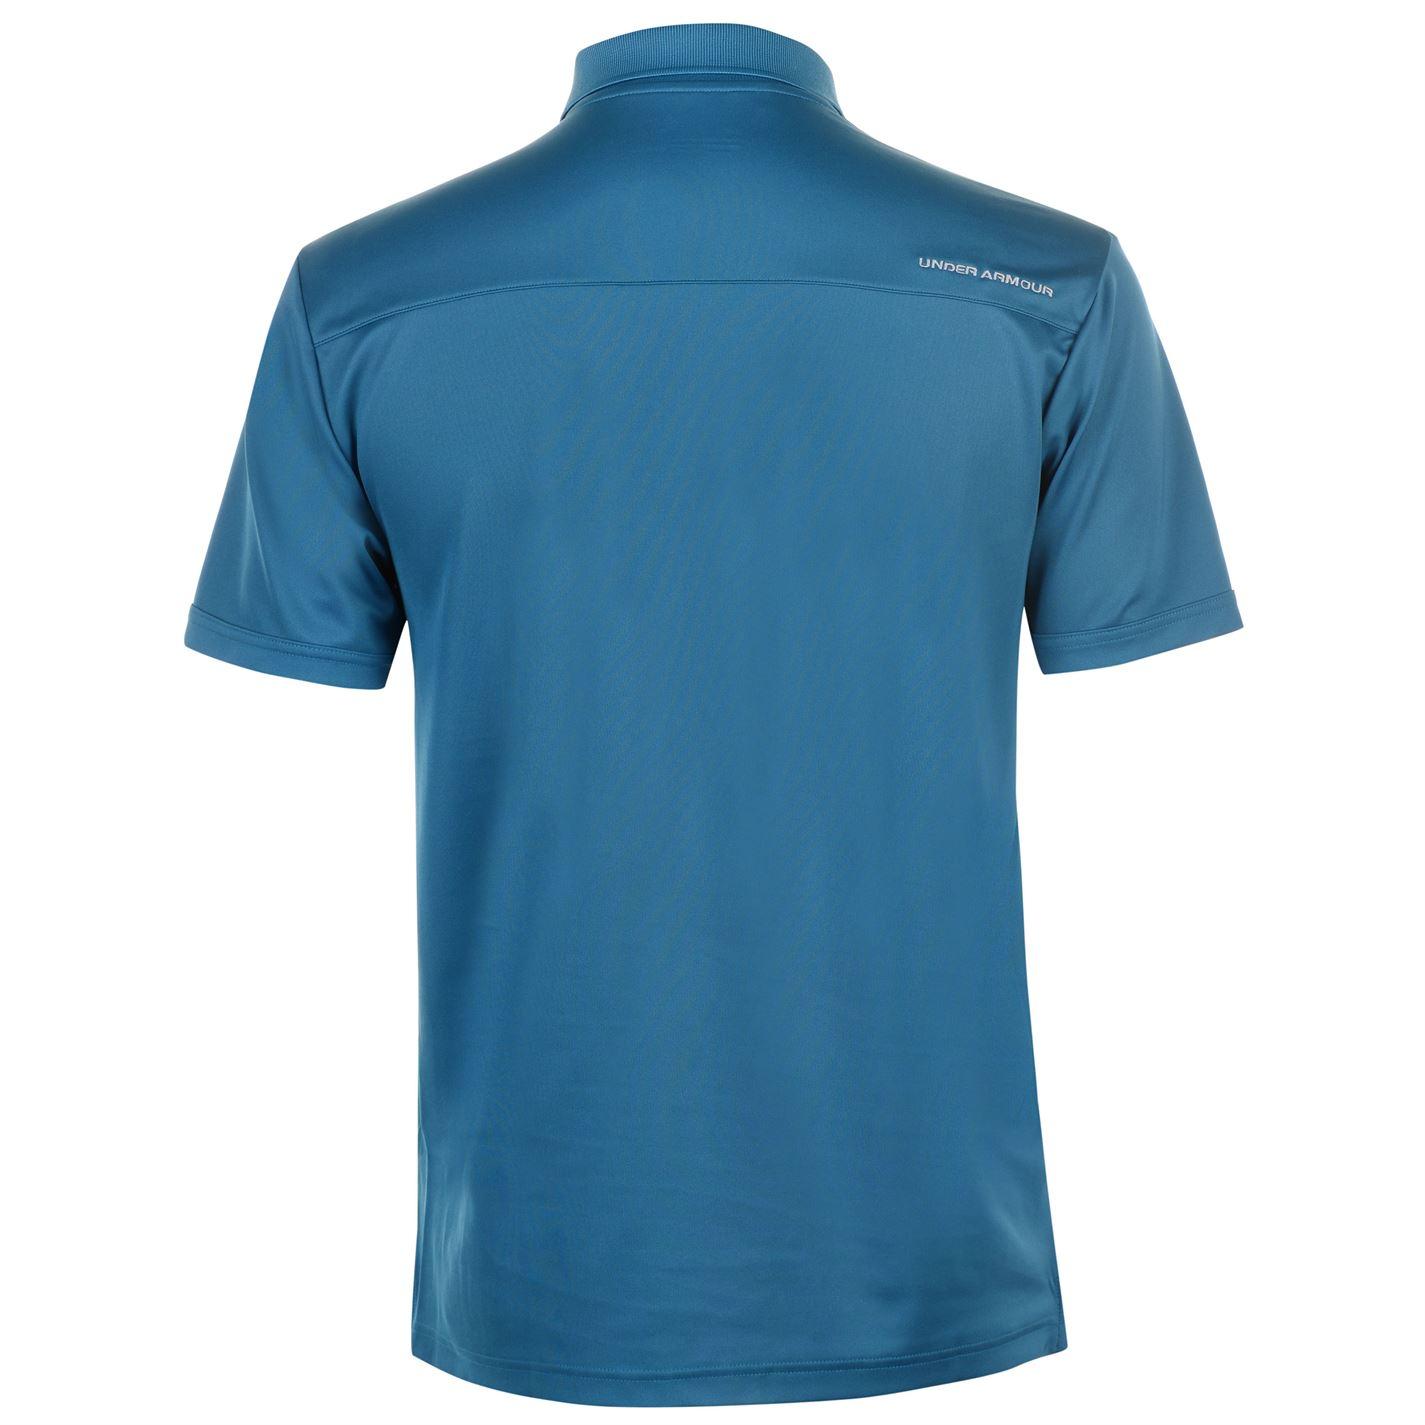 Under-Armour-Camiseta-Polo-para-hombre-realizar-Manga-Corta-Camiseta-Top-Golf-Deportes miniatura 28